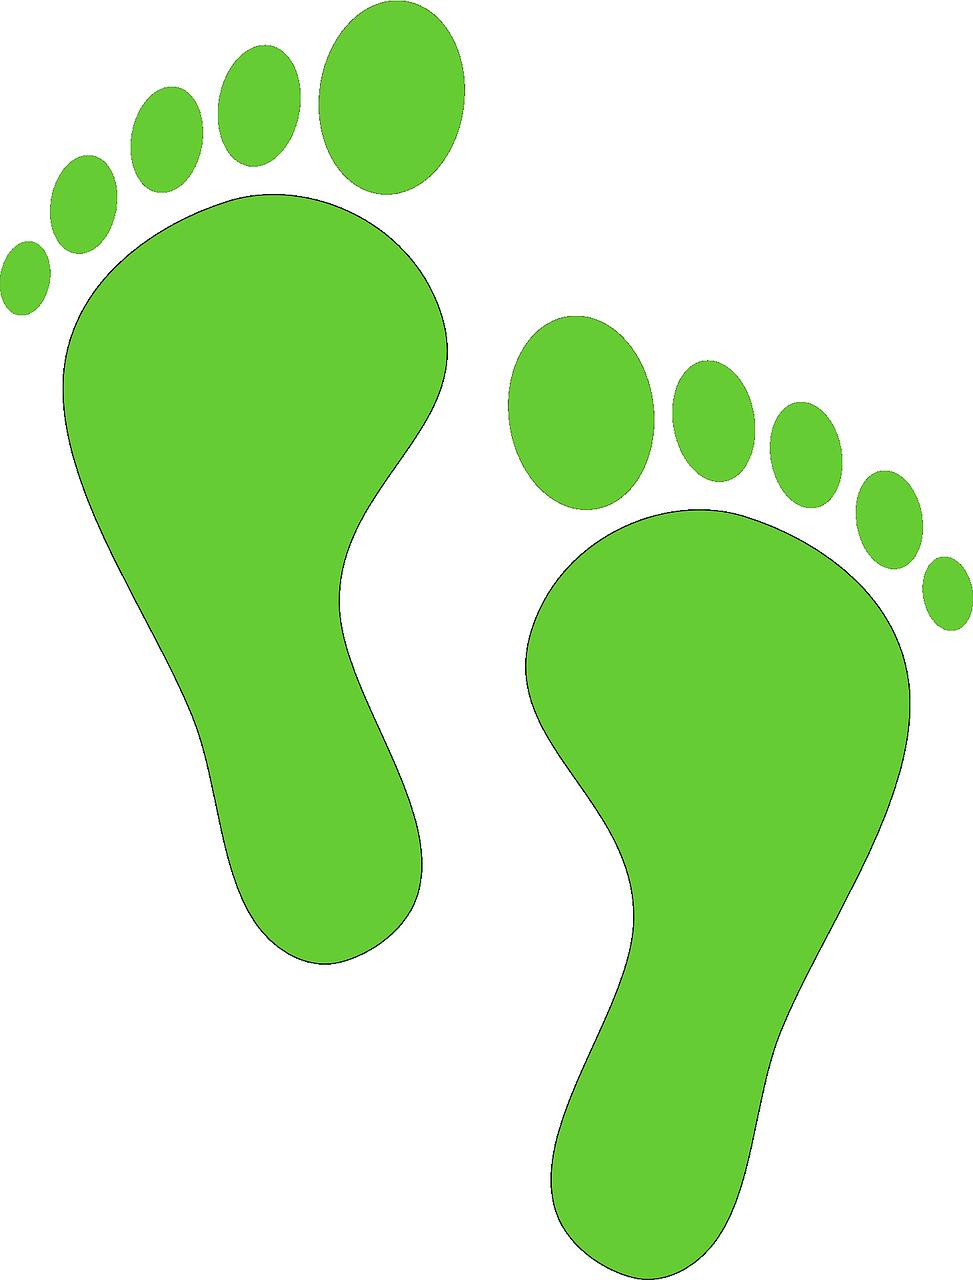 Sustentabilidade modelos pinterest footprints. Foot clipart silhouette